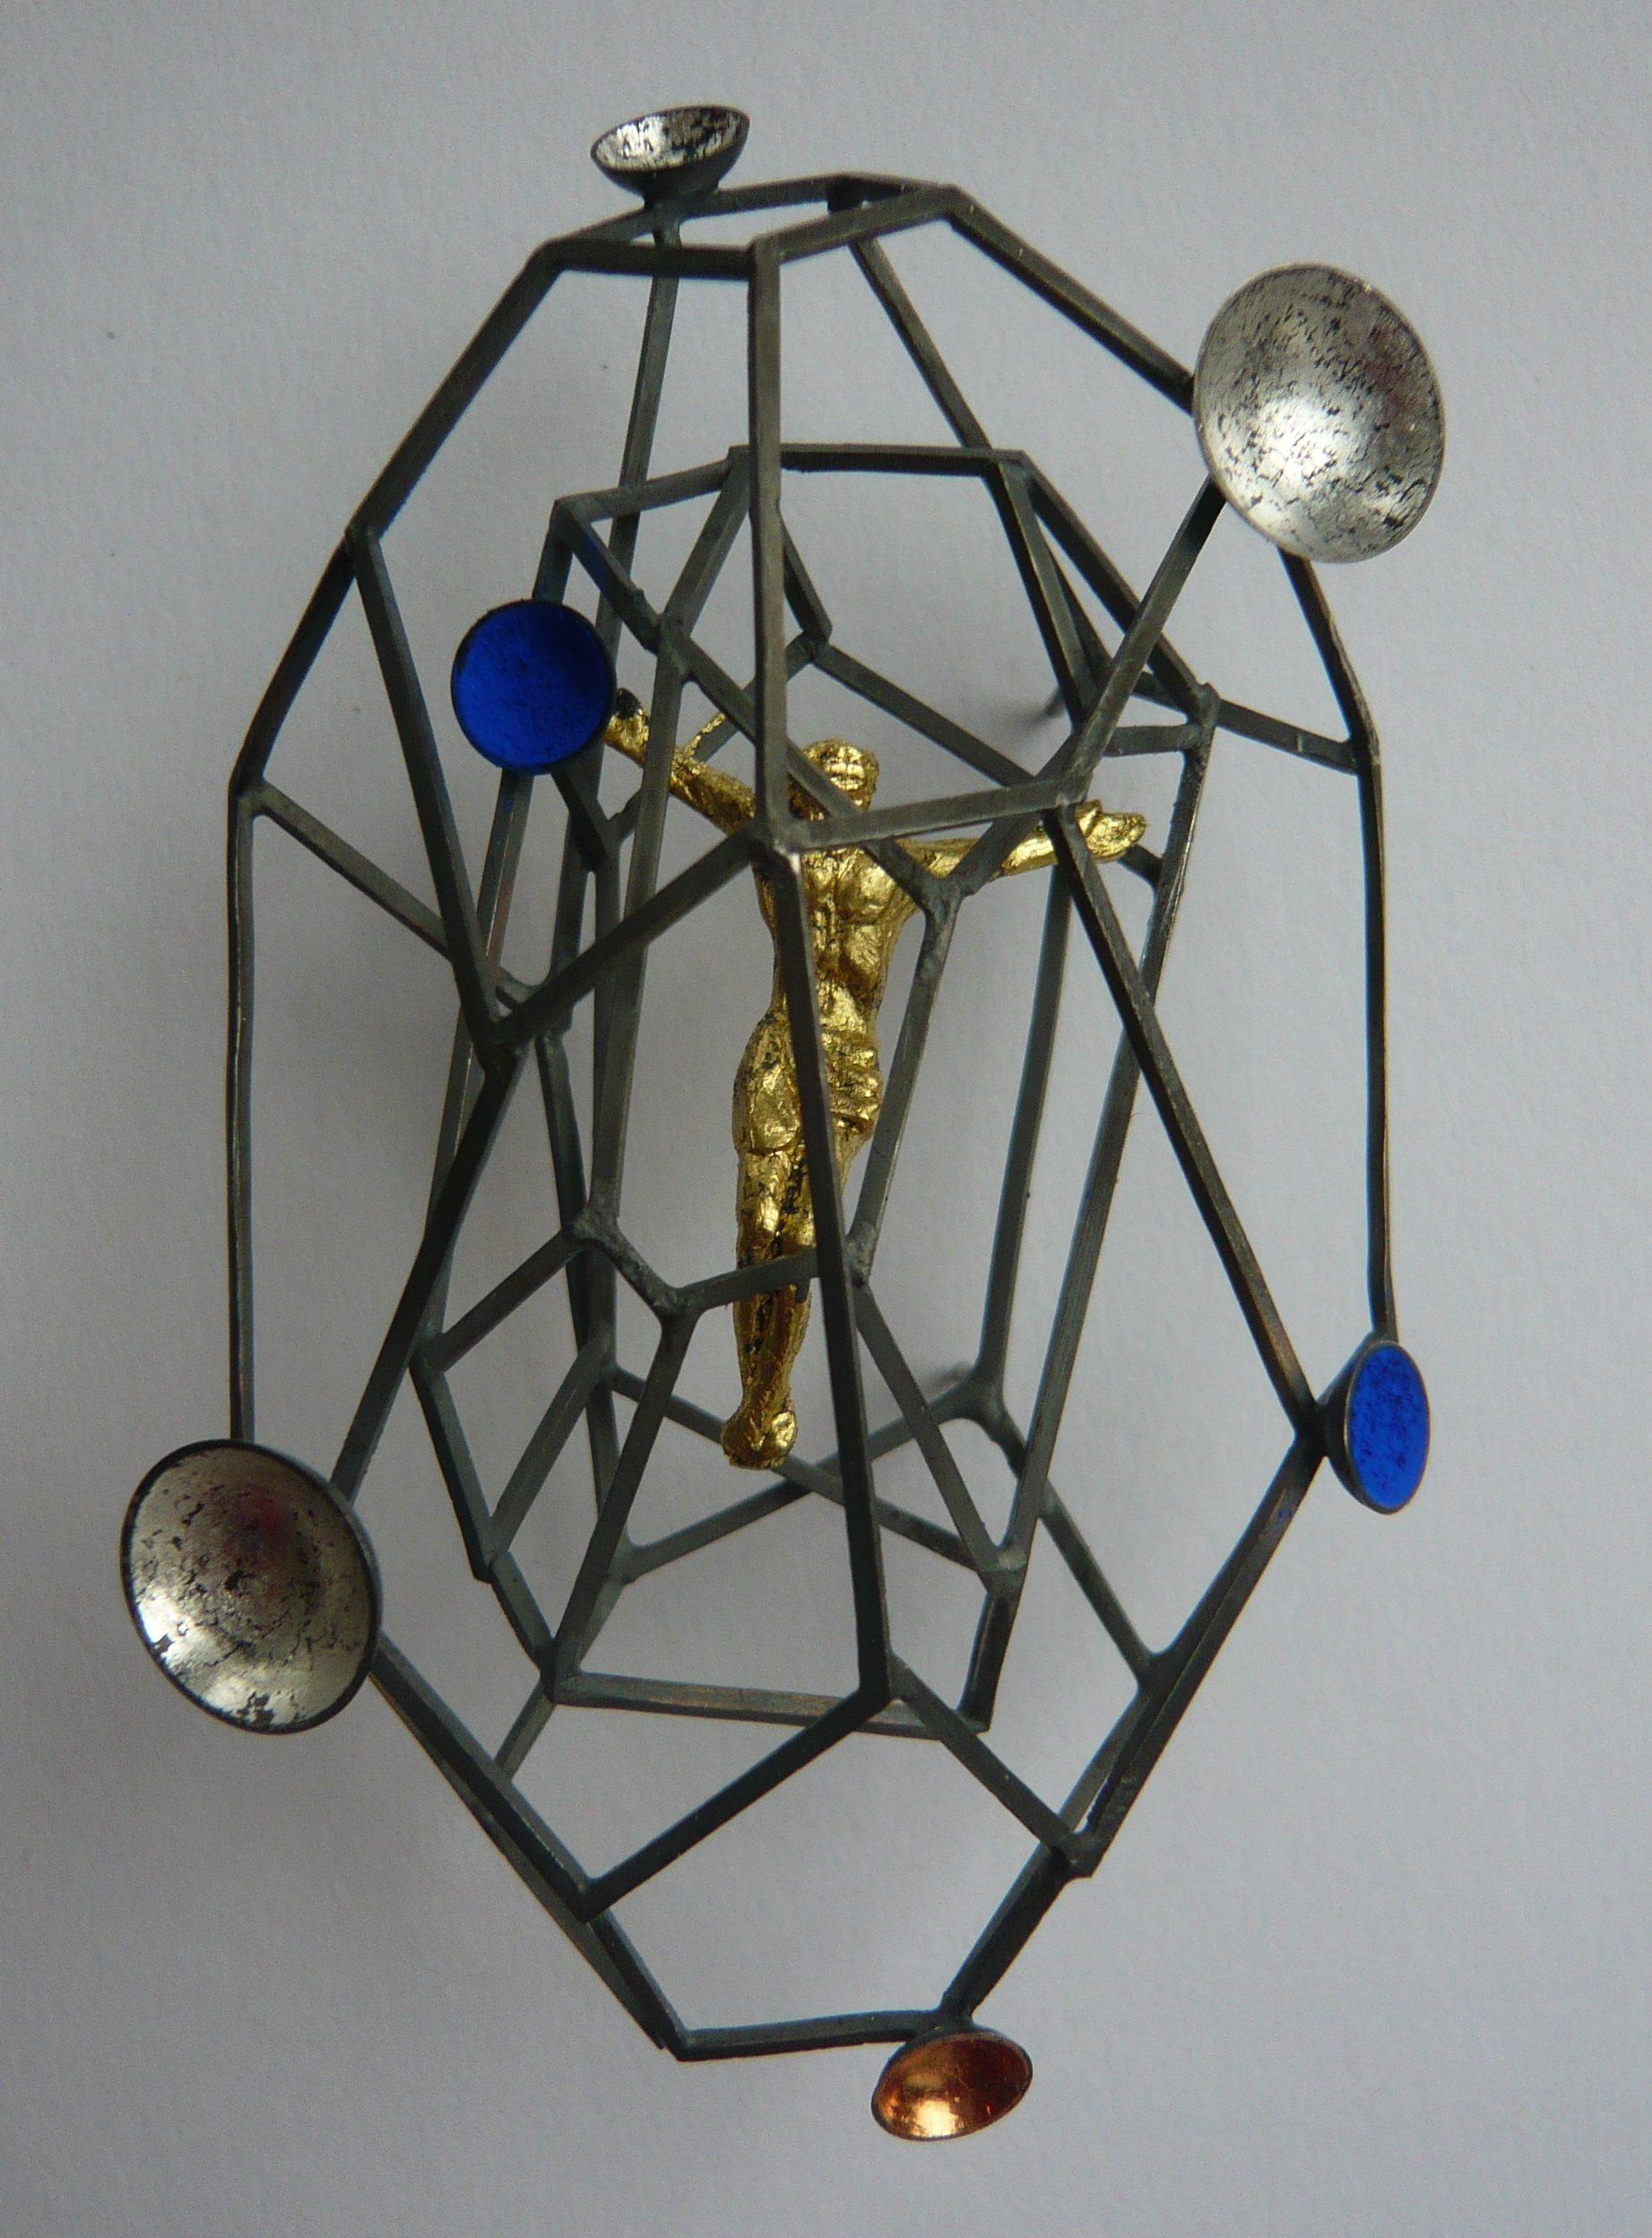 Karol Weisslechner, Cycle Cosmos 4, broche, zilver, pigment, goud